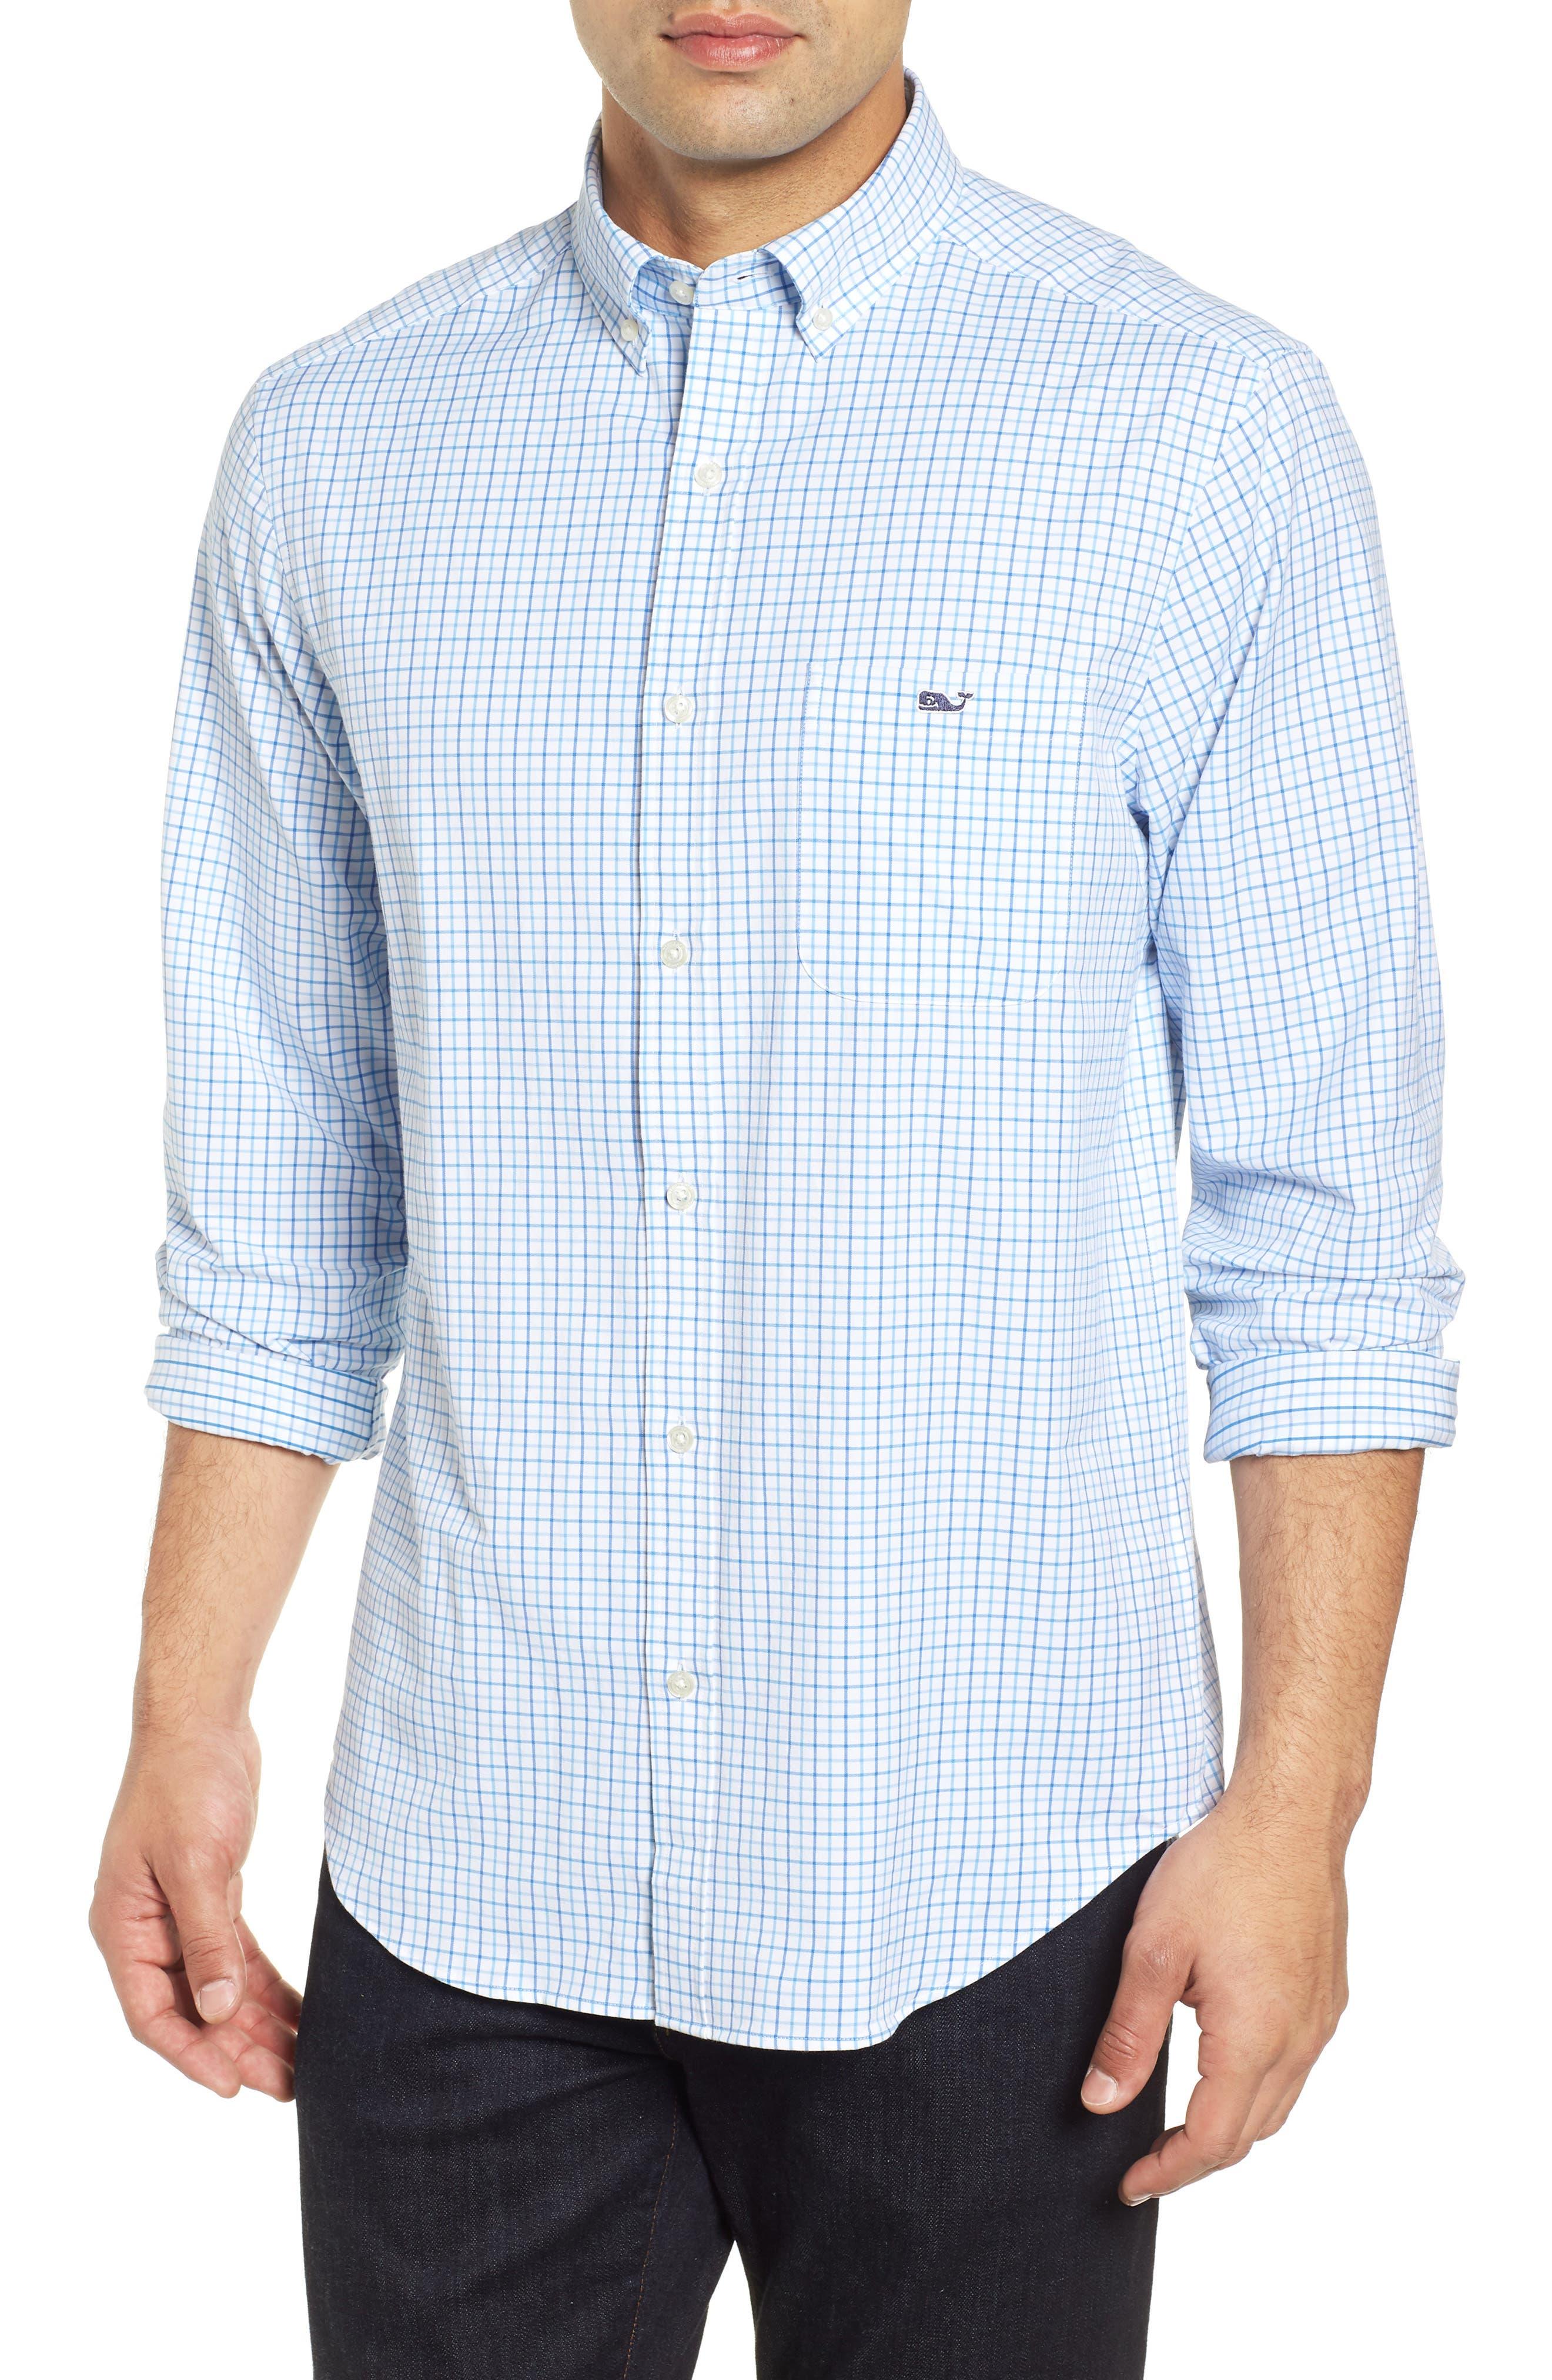 Pepperbush Regular Fit Plaid Sport Shirt,                             Main thumbnail 1, color,                             427